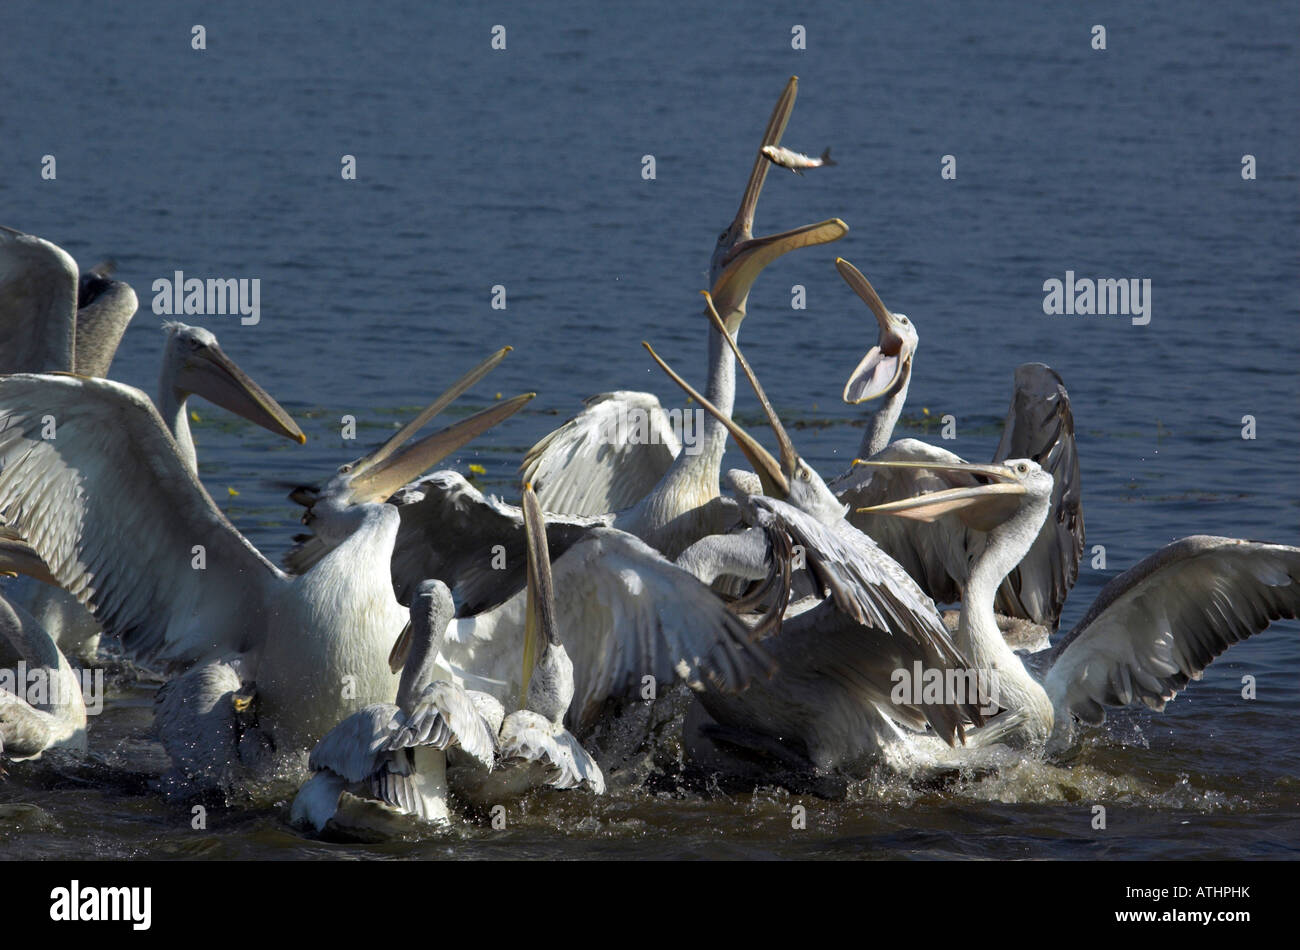 Dalmatian Pelican (Pelecanus crispus). Group squabbling over a fish that has been thrown to them - Stock Image